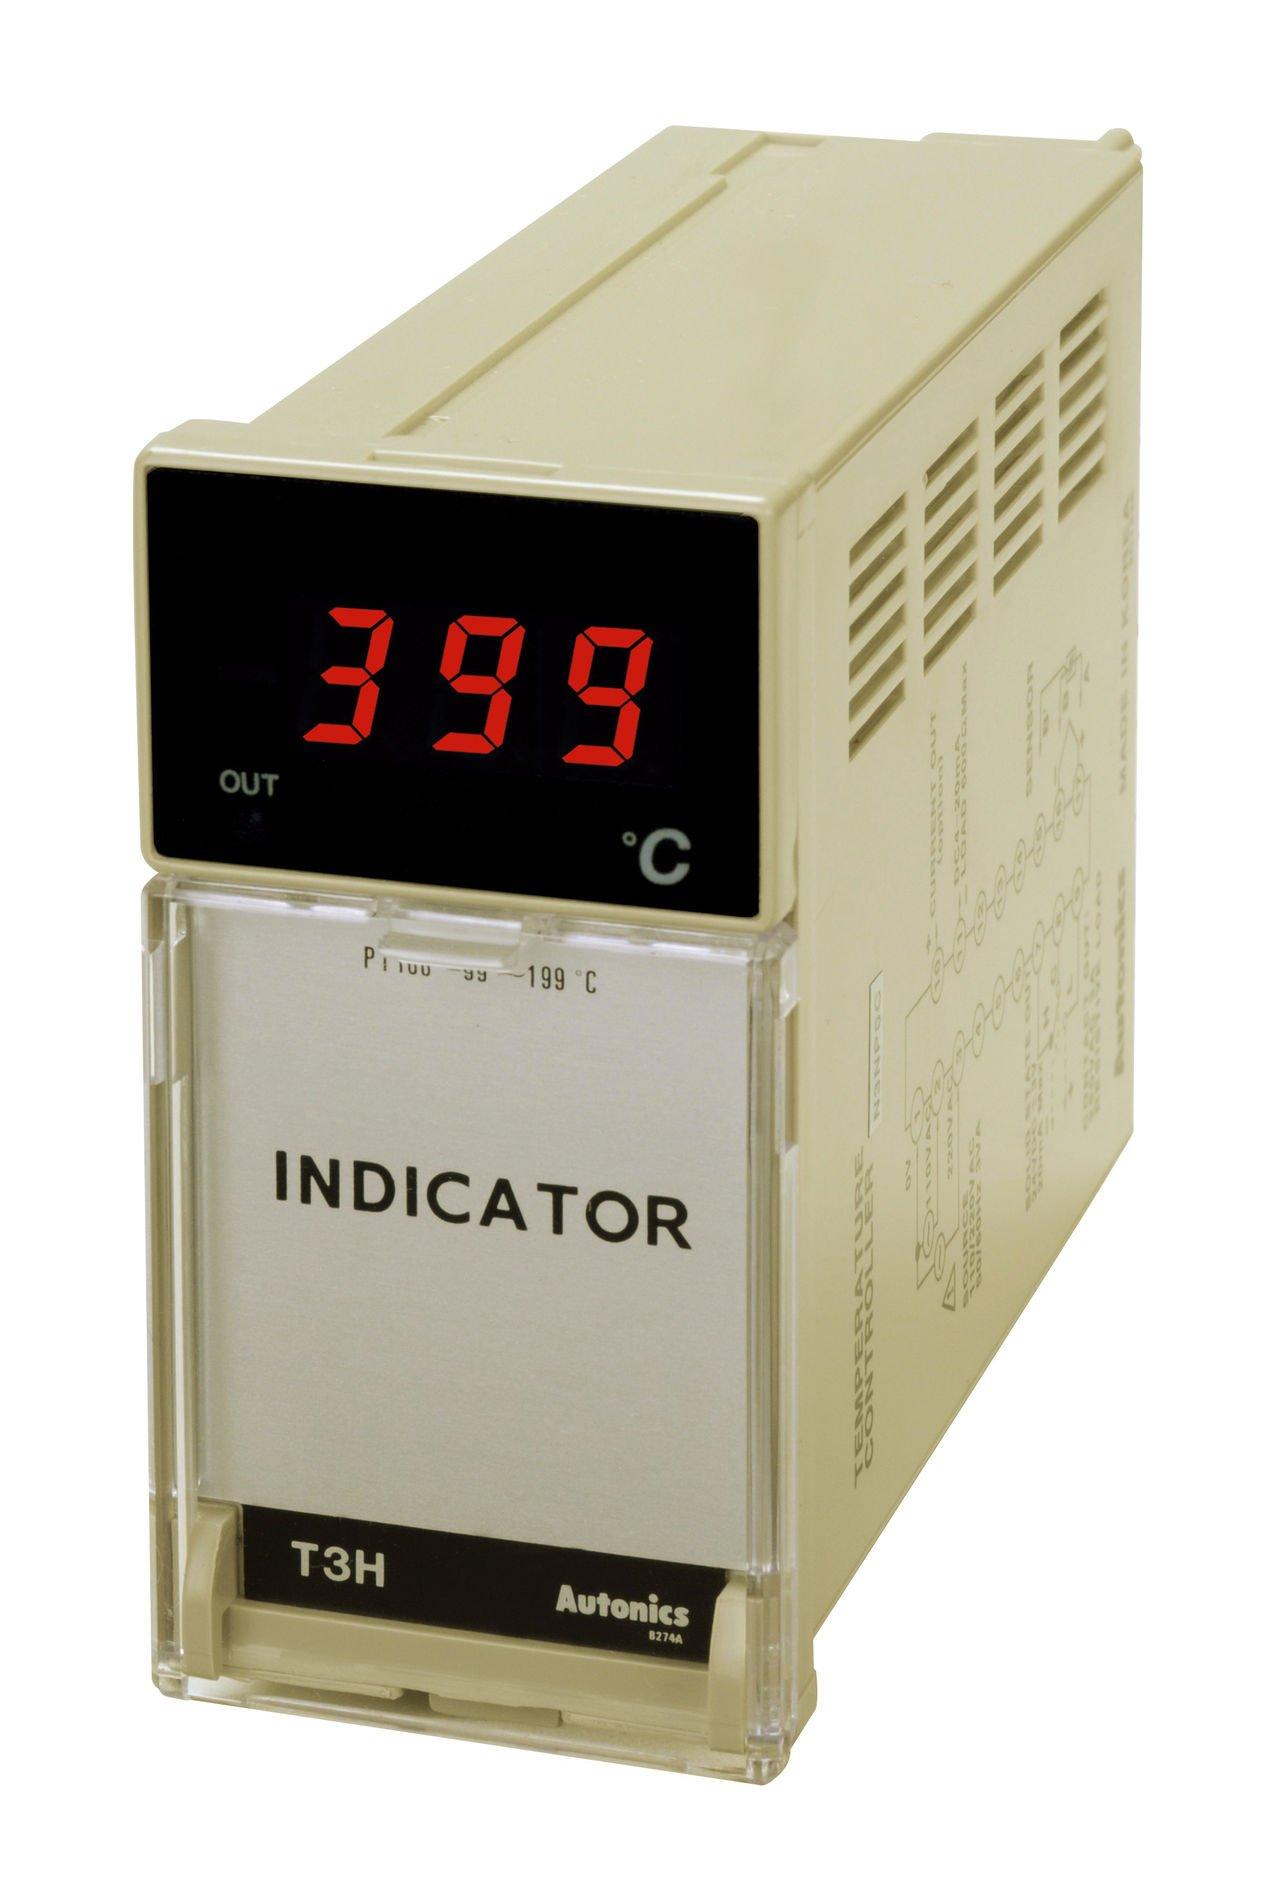 Autonics T3HI-N3NKAC Temperature Indicator, W48xH96mm, K Thermocouple Input, 999 C, 110 & 220 VAC